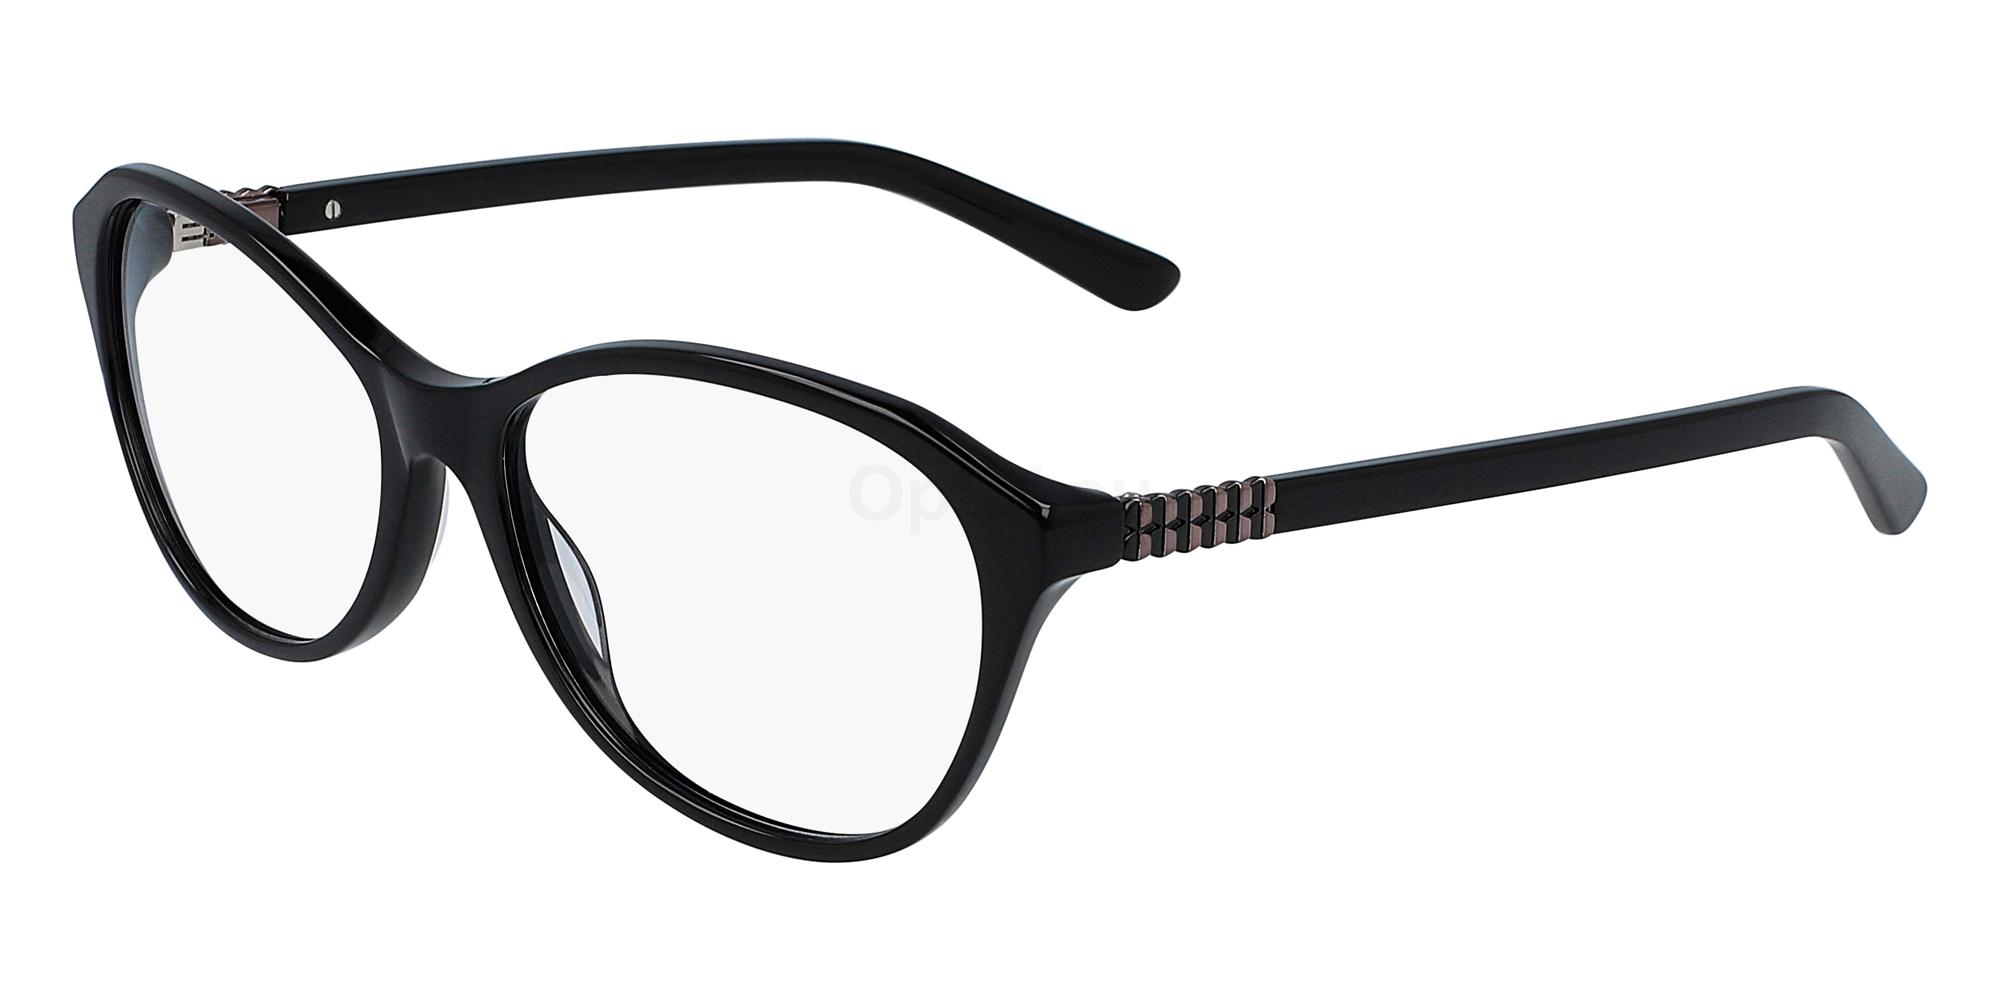 001 SK2836 TREND Glasses, Skaga